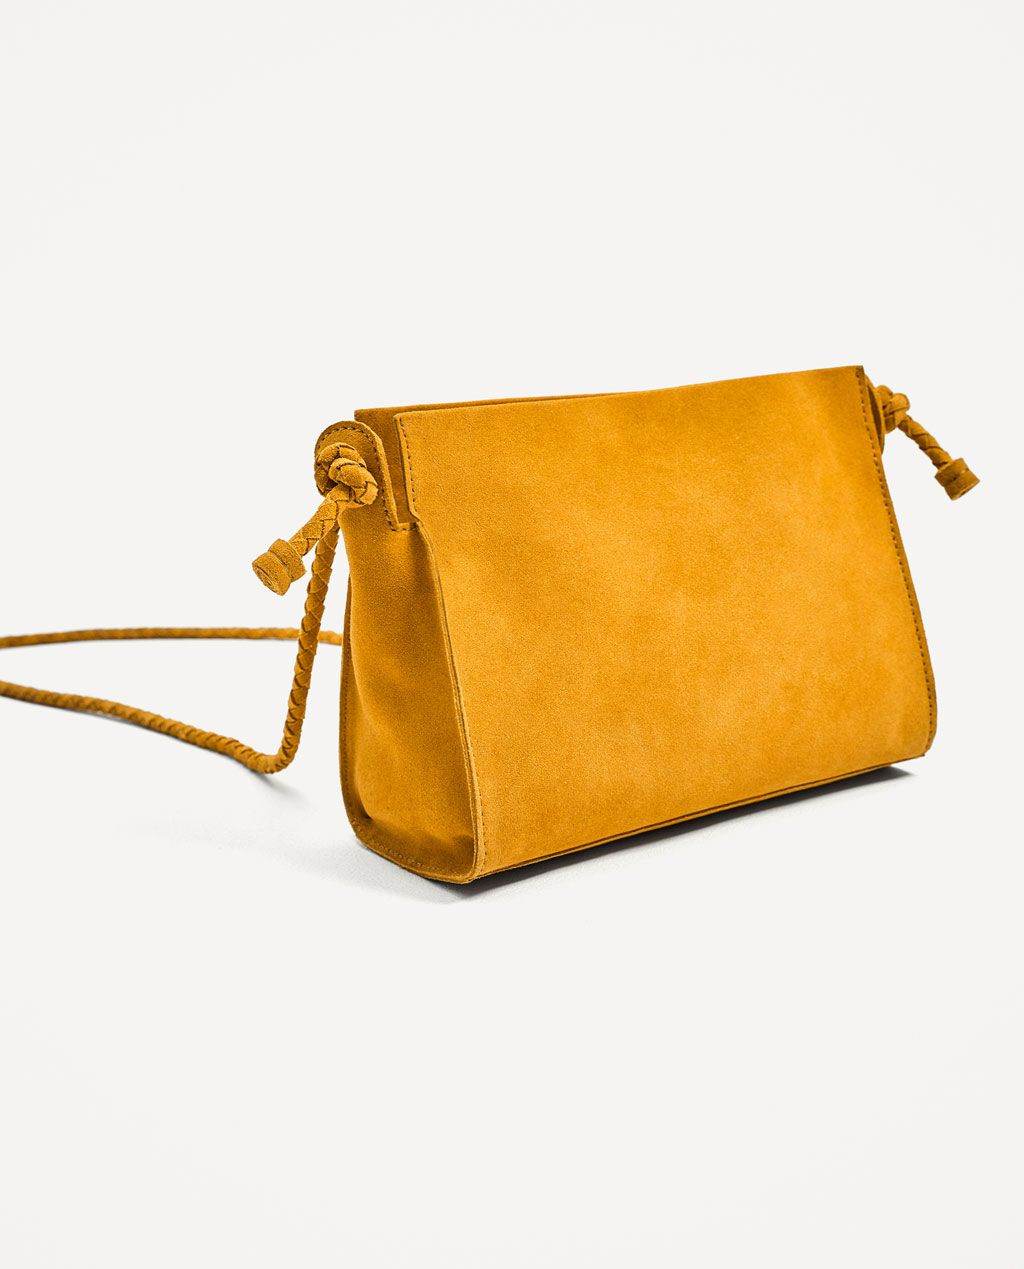 57df258fbc76 Image 1 of SPLIT SUEDE CROSSBODY BAG from Zara